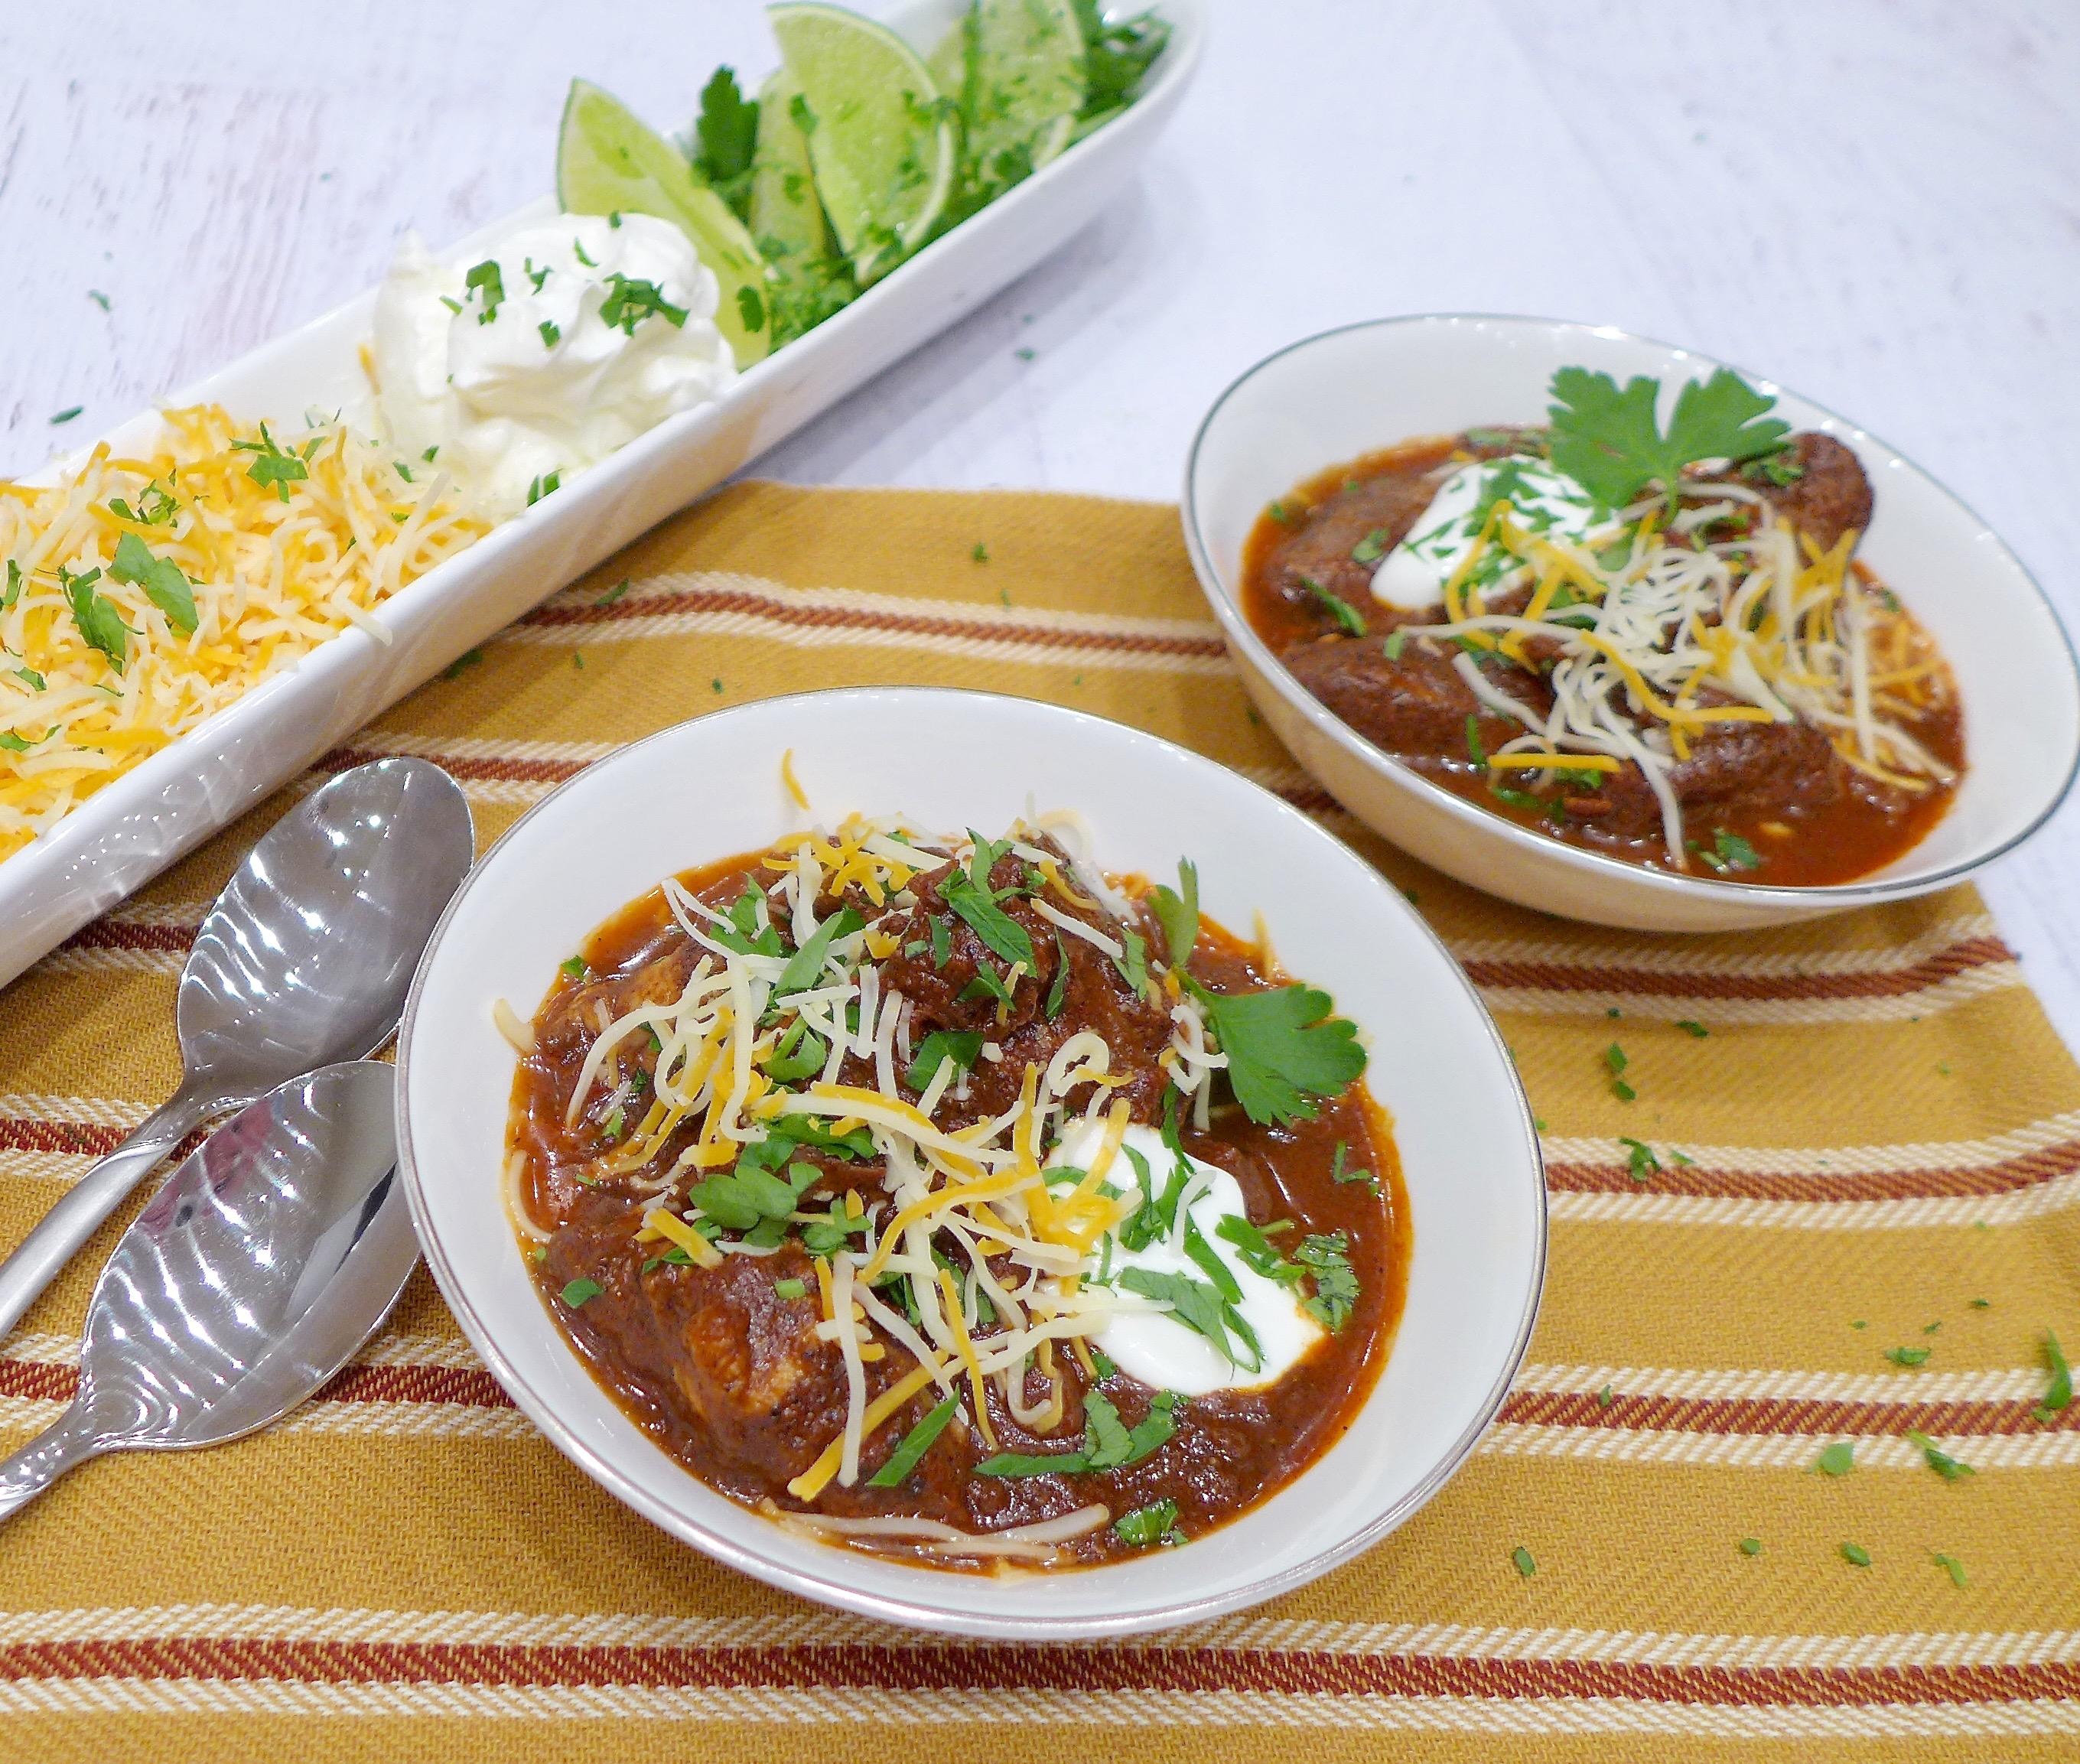 Little Spicy Mexican Stew at diginwithdana.com